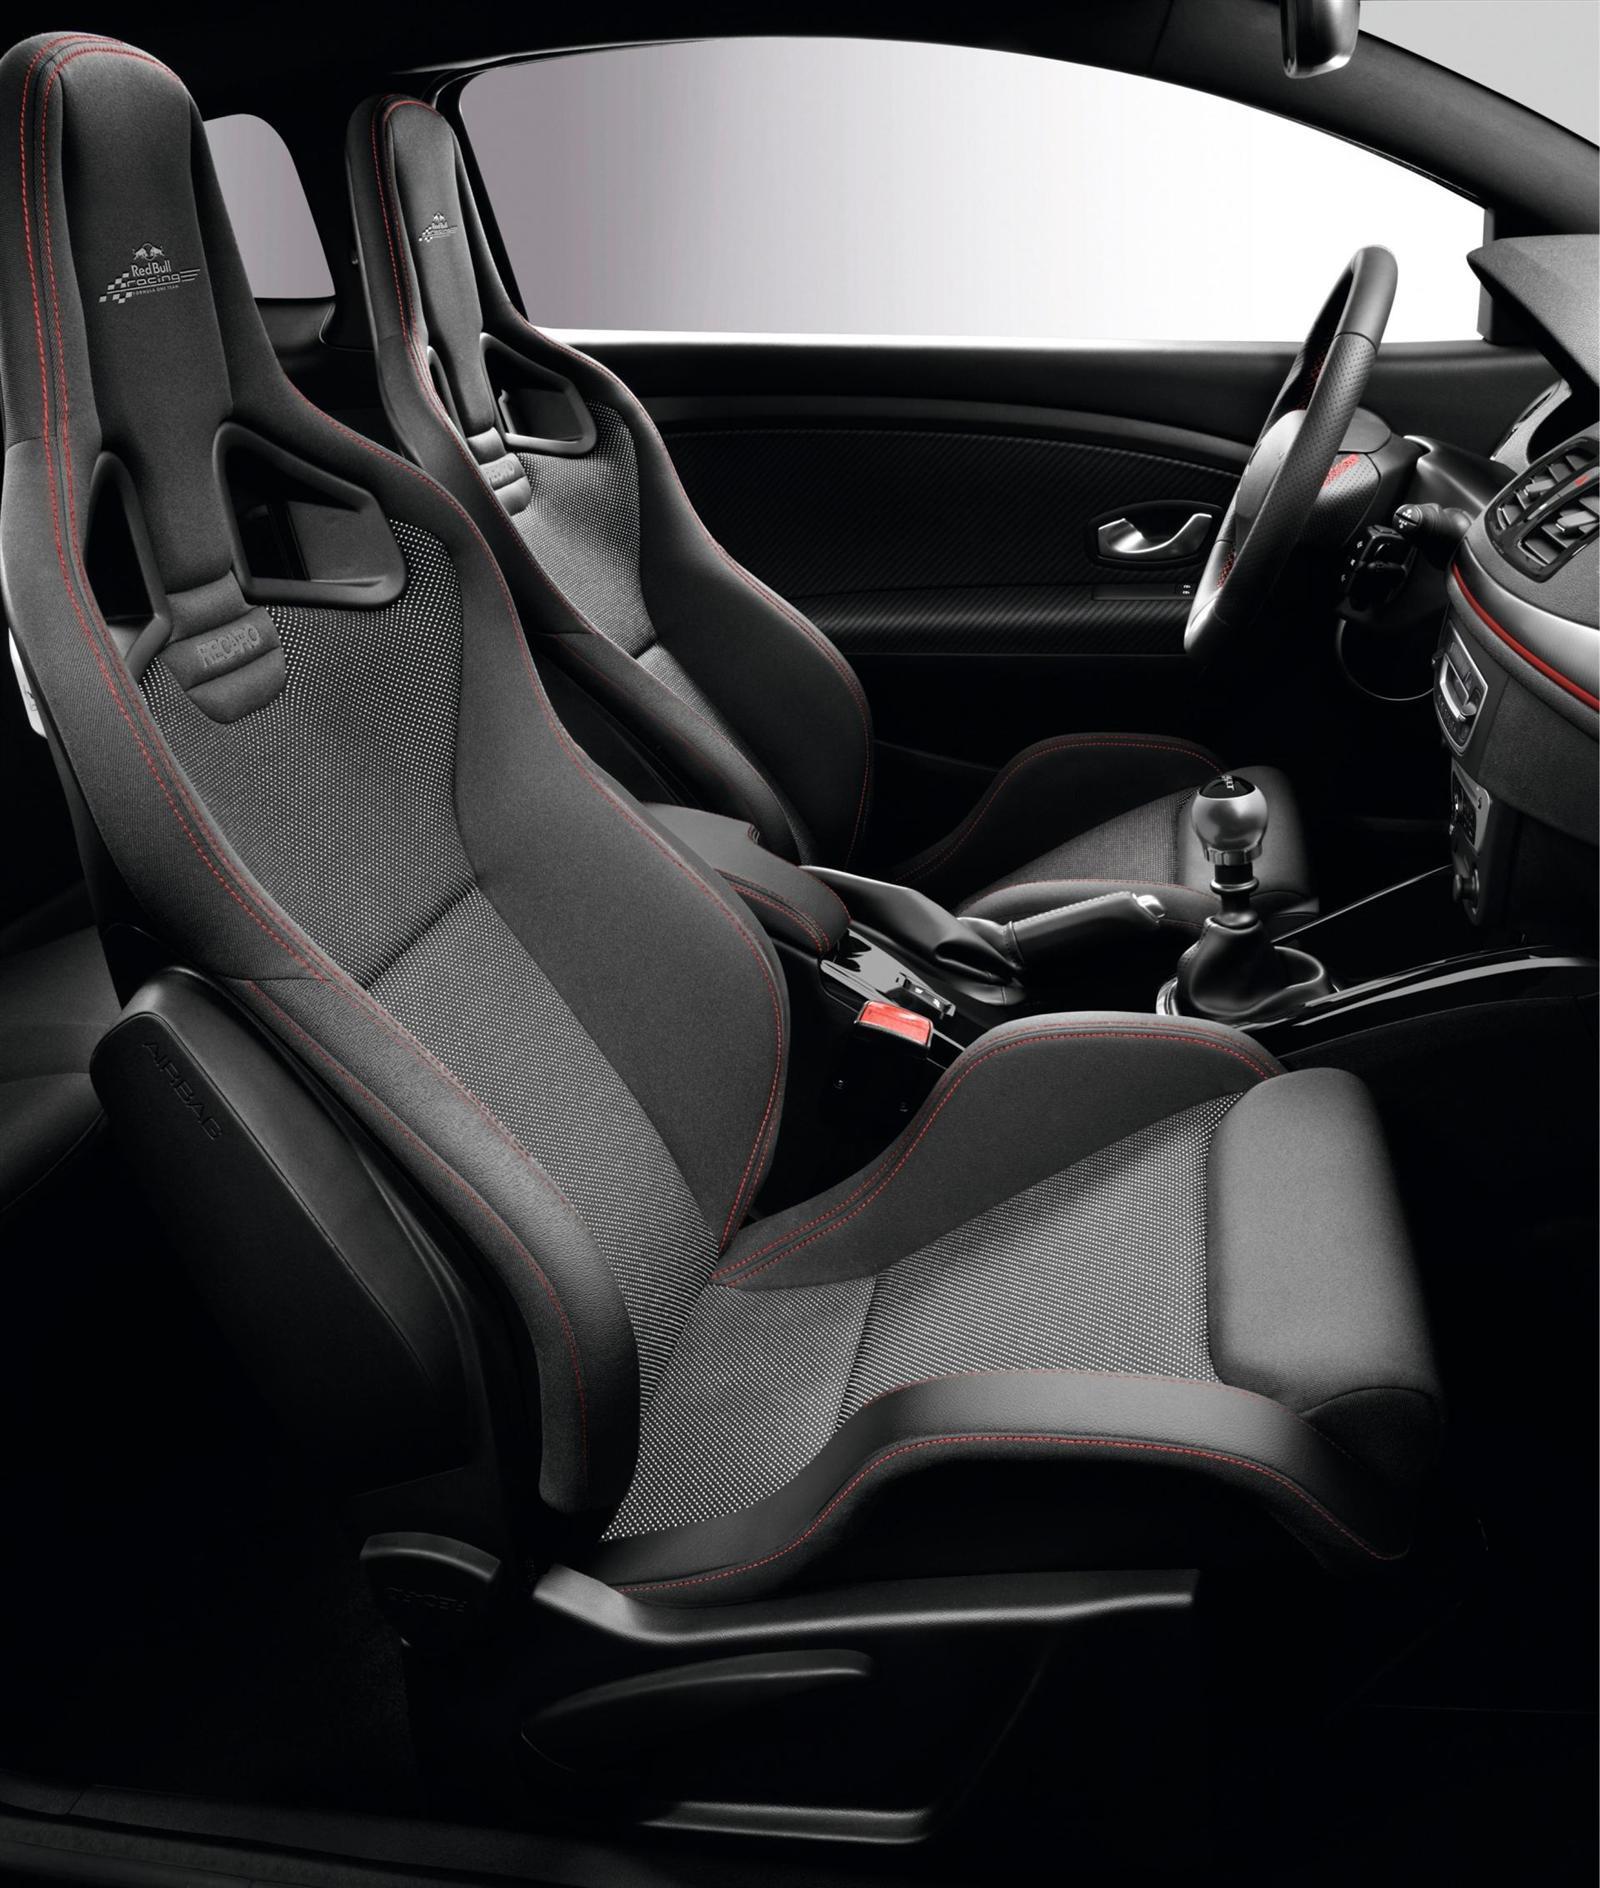 Renault Megane rs 2013 Interior 2013 Renault m Gane r s Red